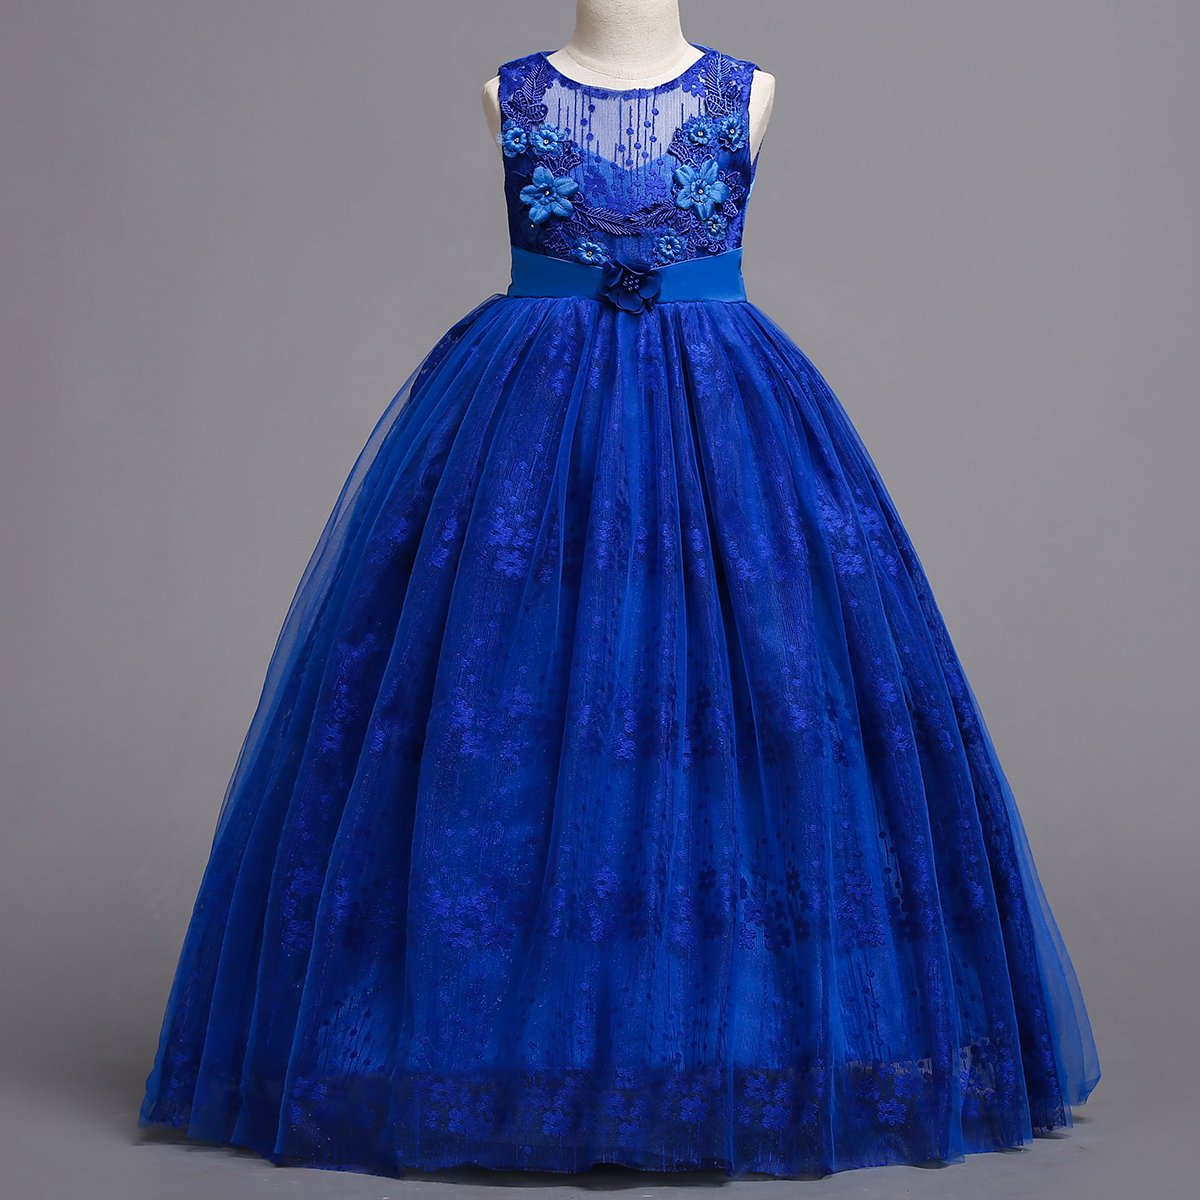 Amazon.com: OBEEII Little Big Girl Flower Tutu Dress Princess Pageant Wedding Junior Bridesmaid First Communion Ball Gown: Clothing